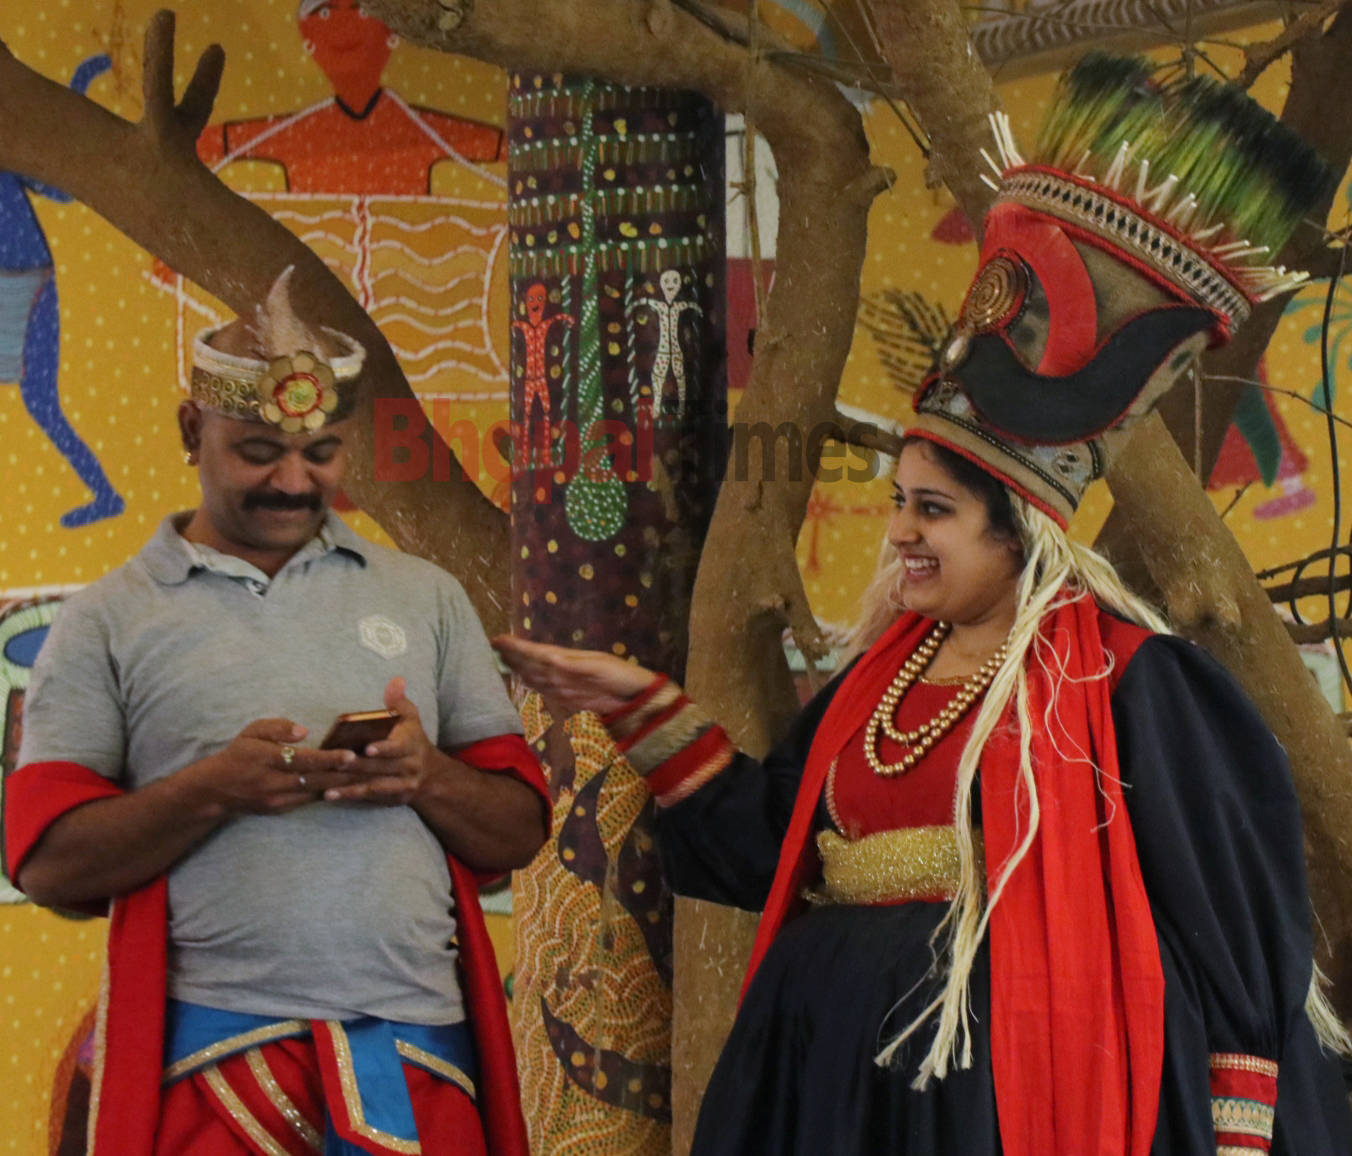 Hanuman and Ravana chilling